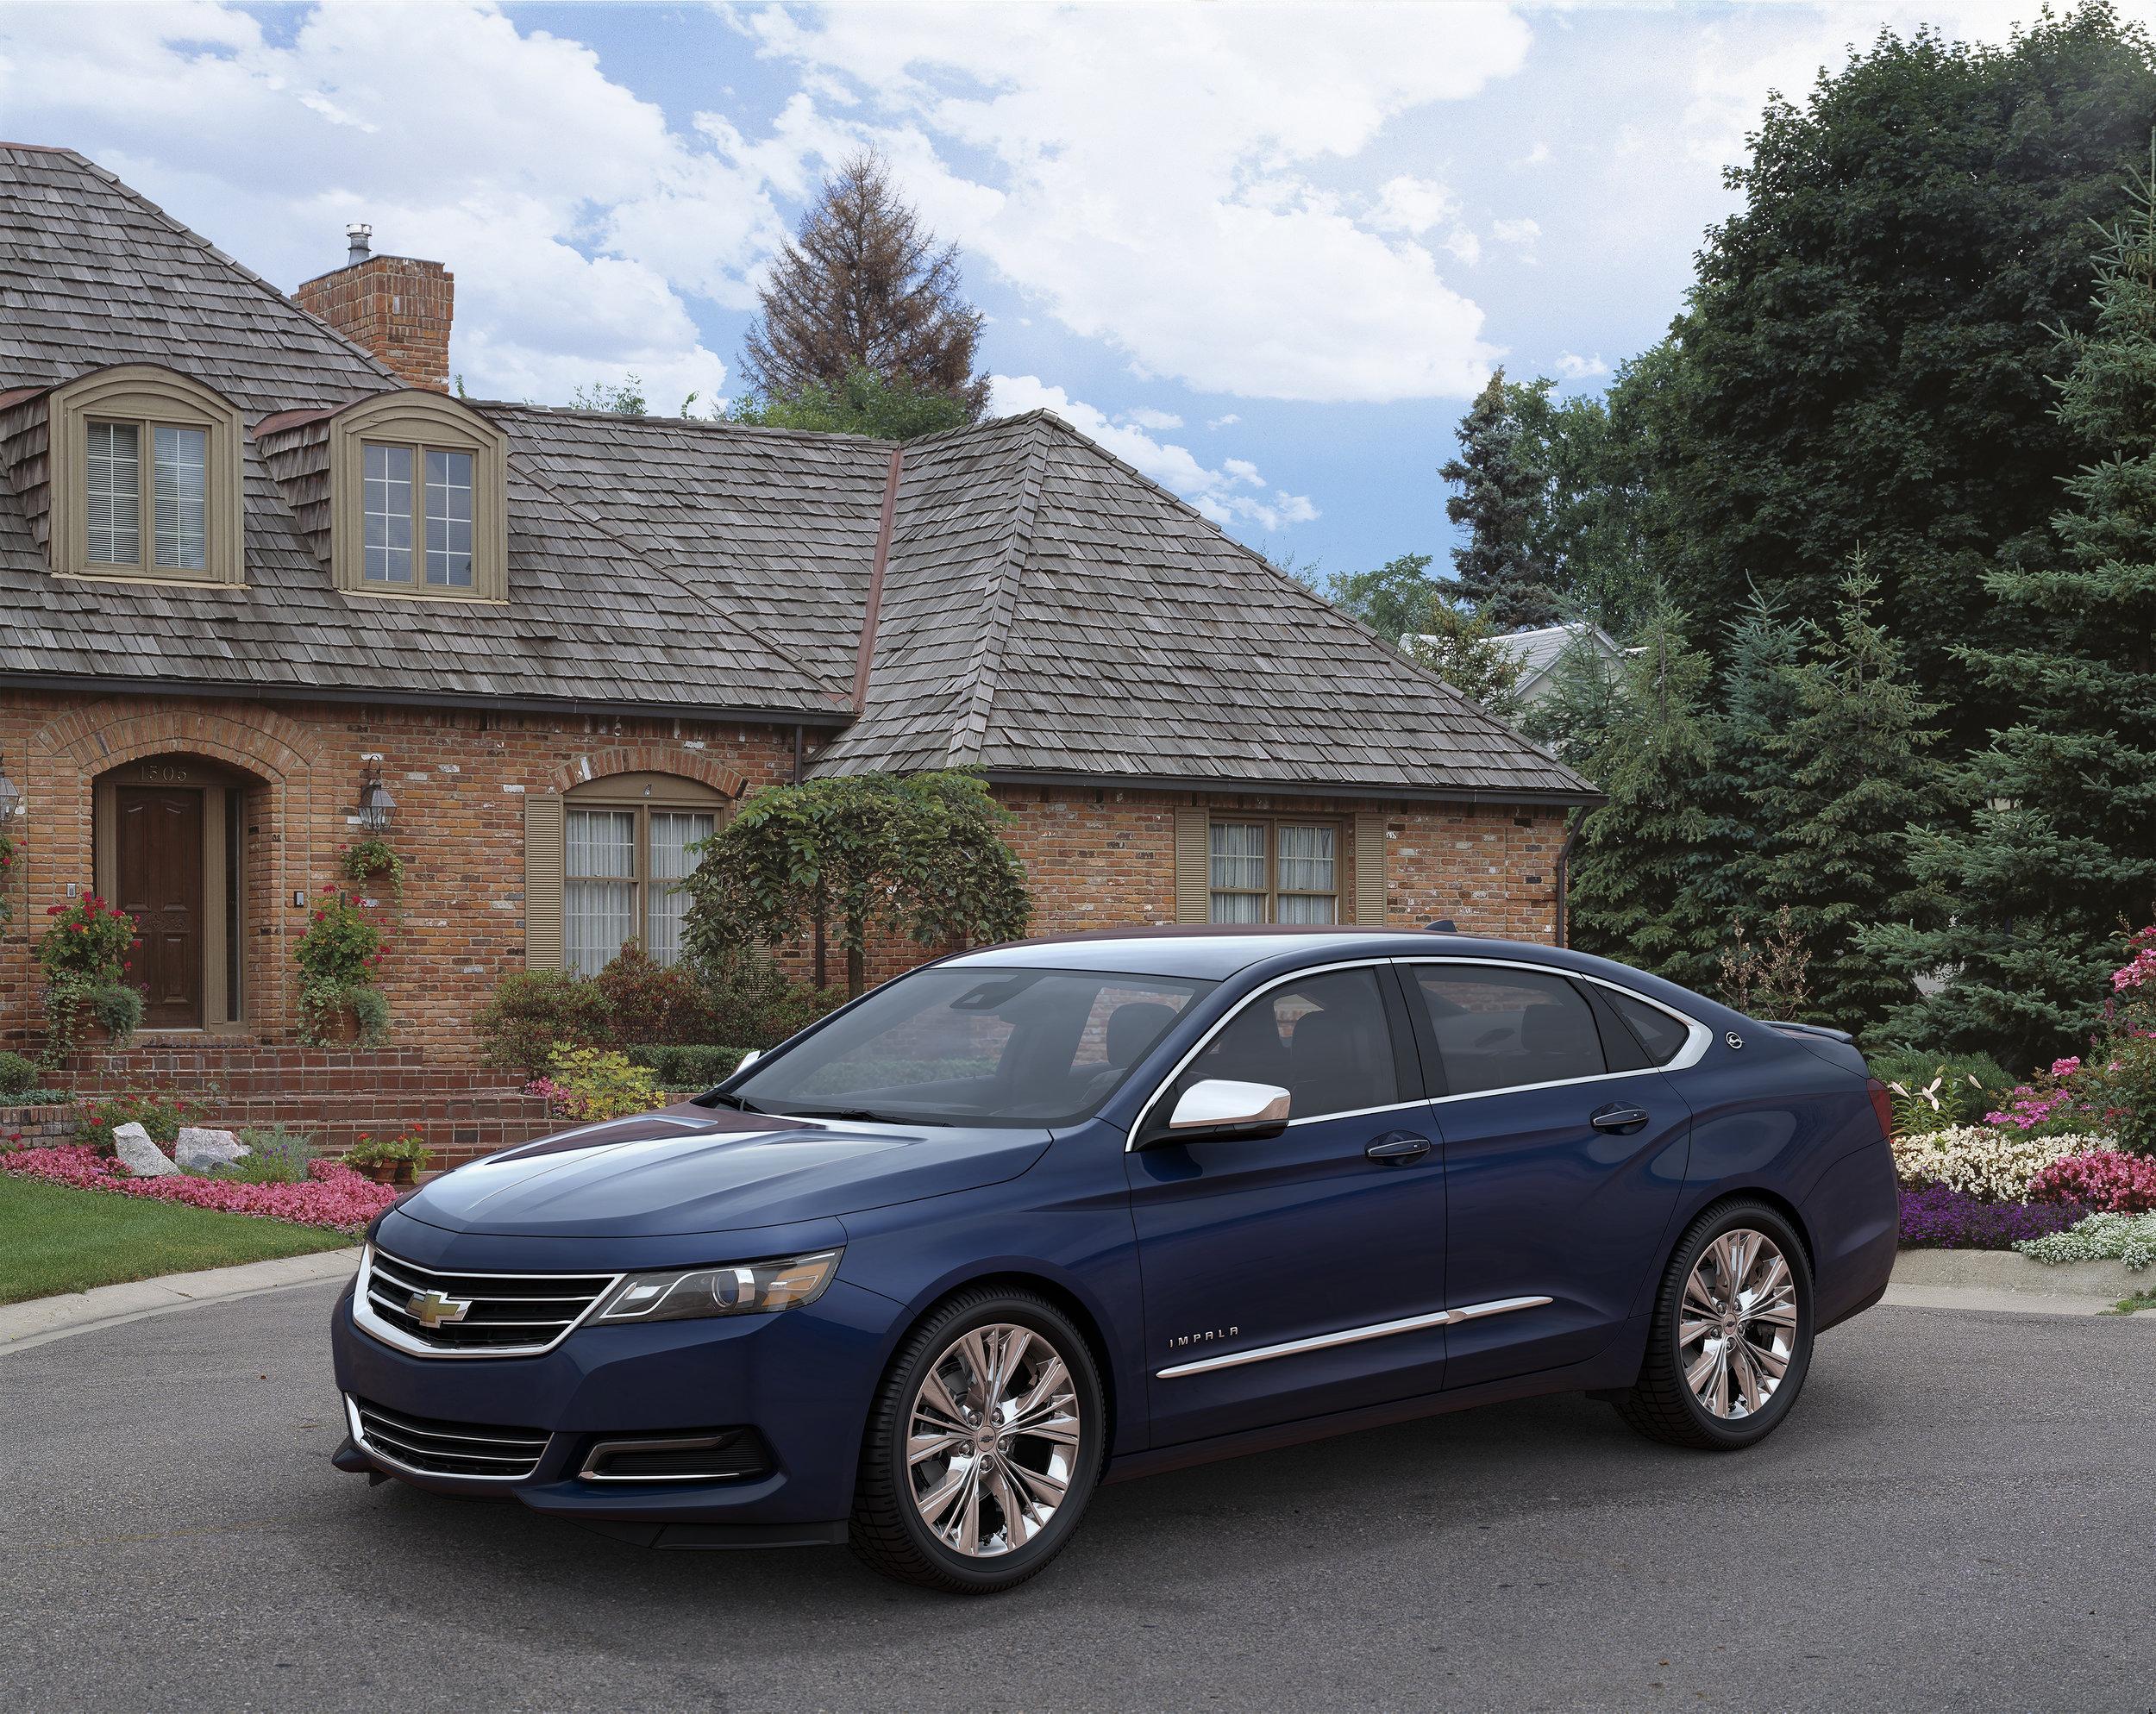 3D Impala Suburbia 3/4 Front